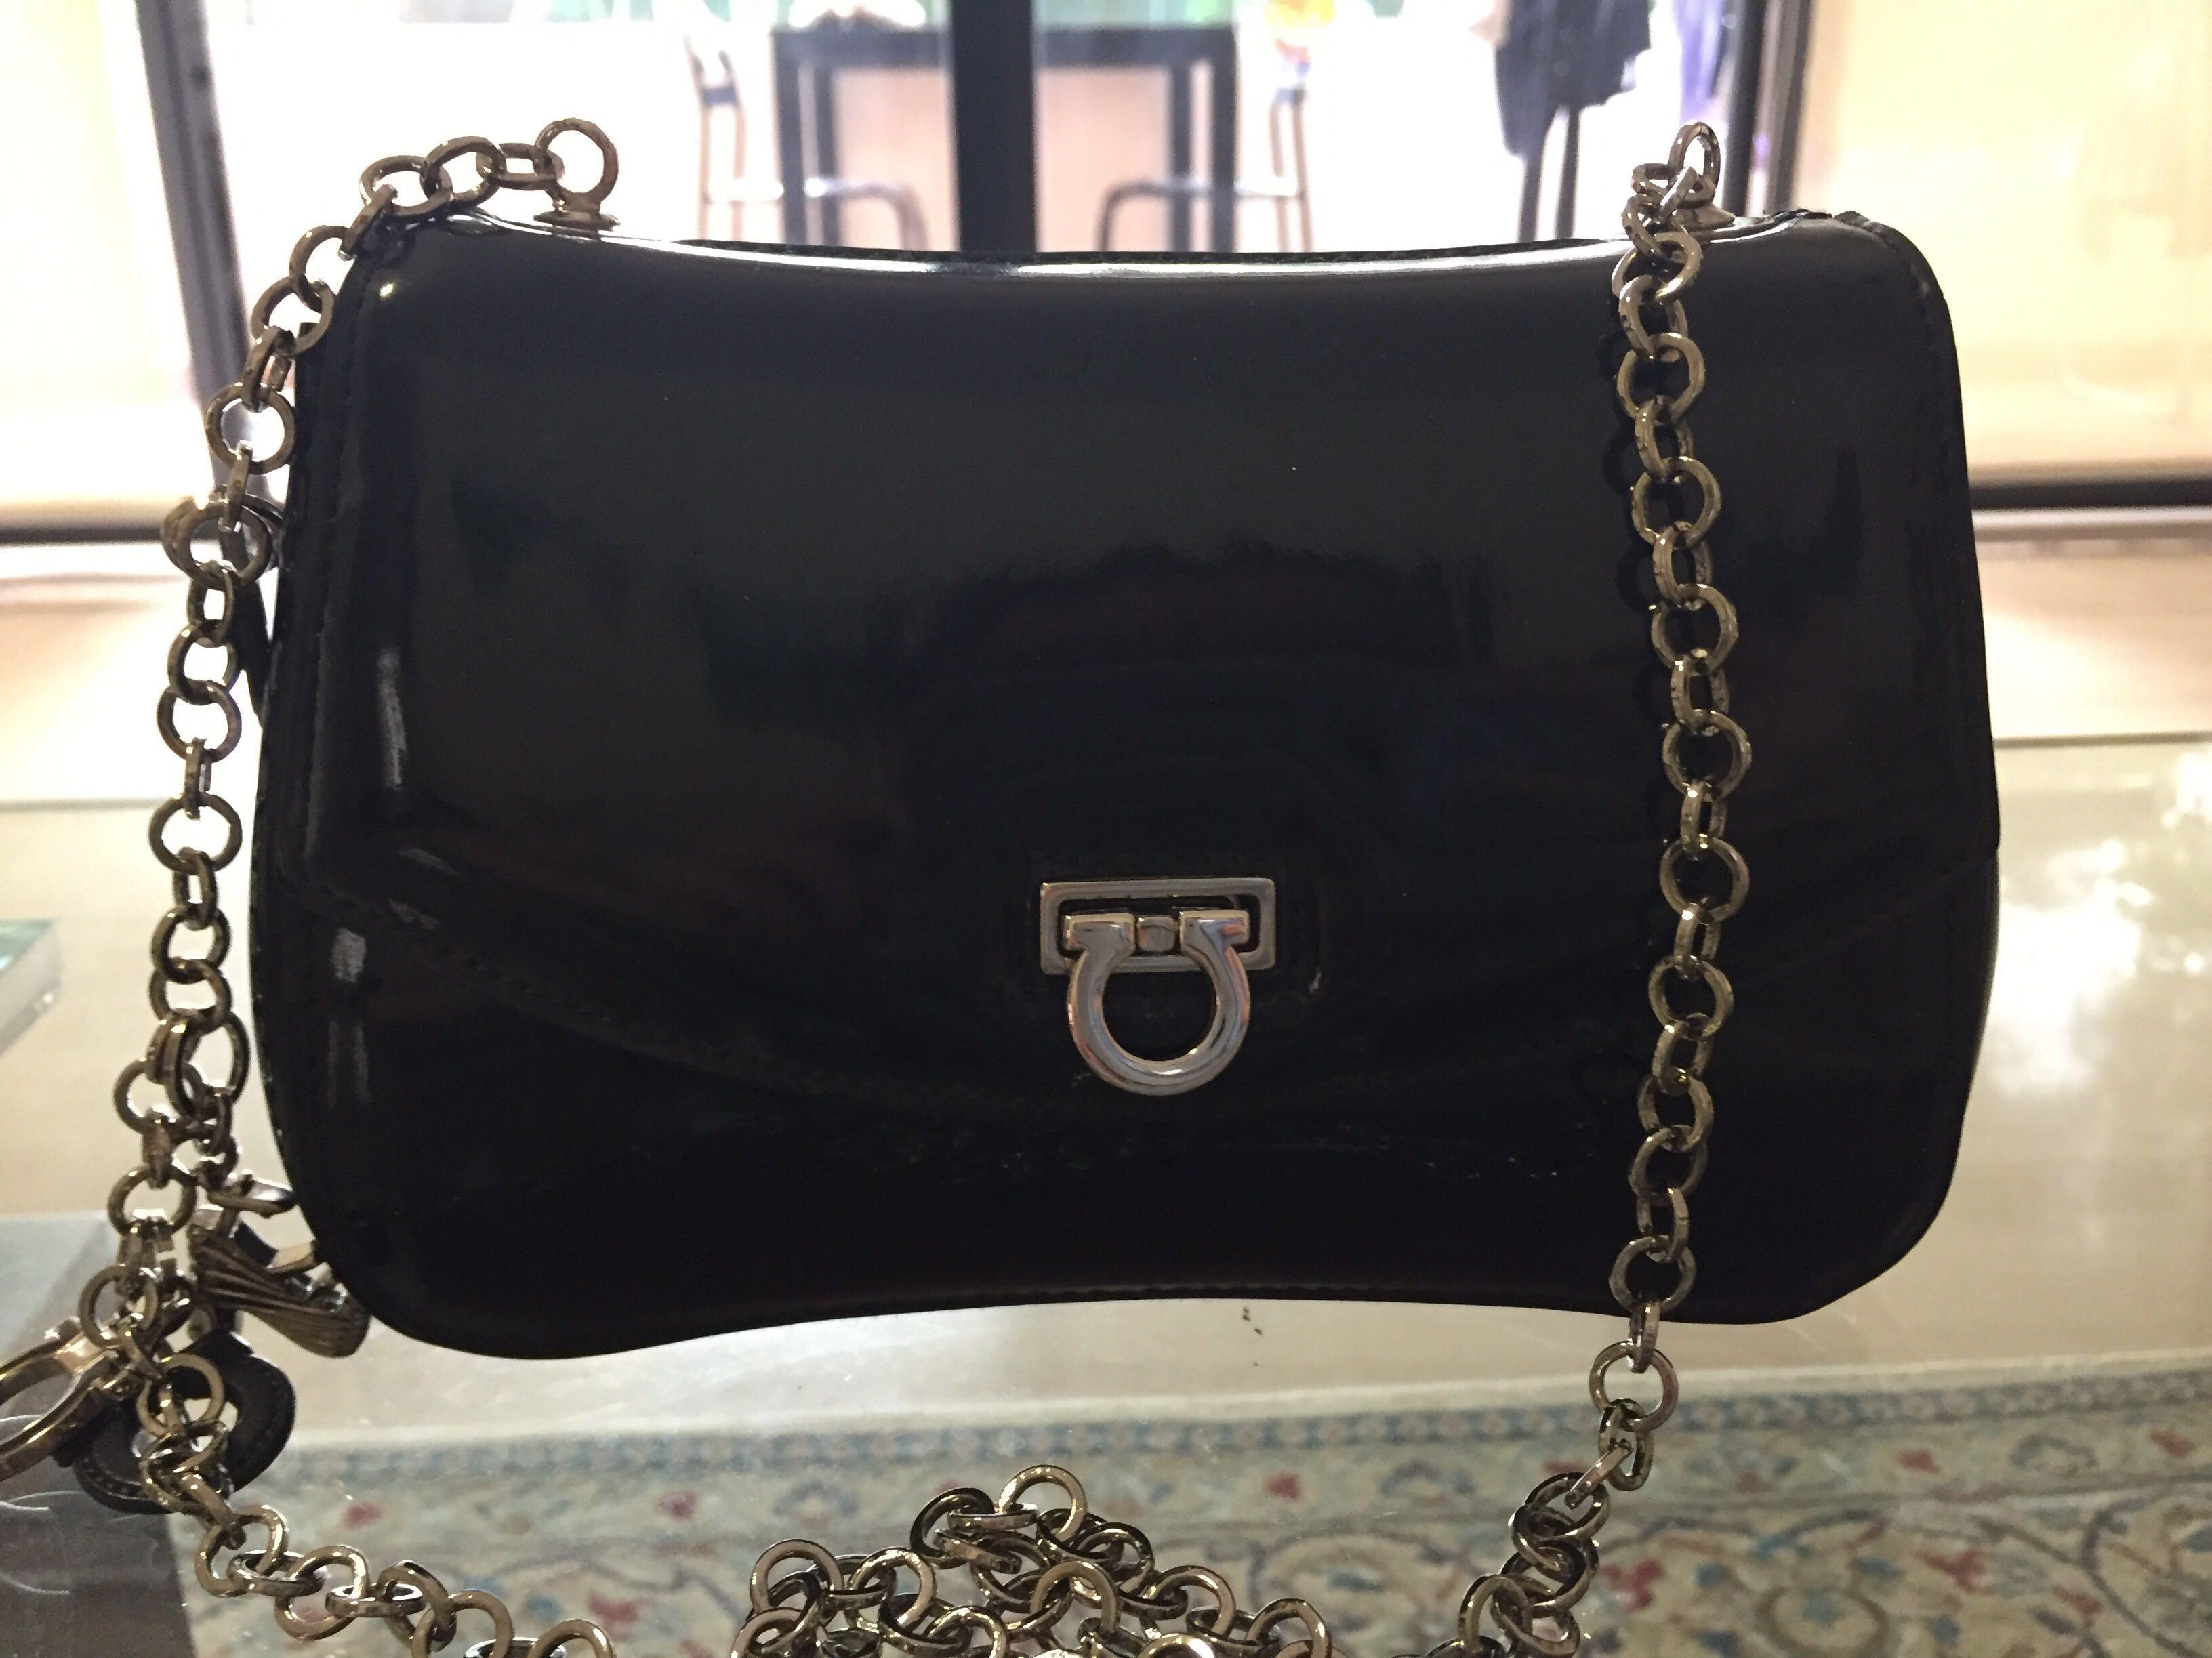 3b60503bdd Home · Women s Fashion · Bags   Wallets · Clutches. photo photo ...